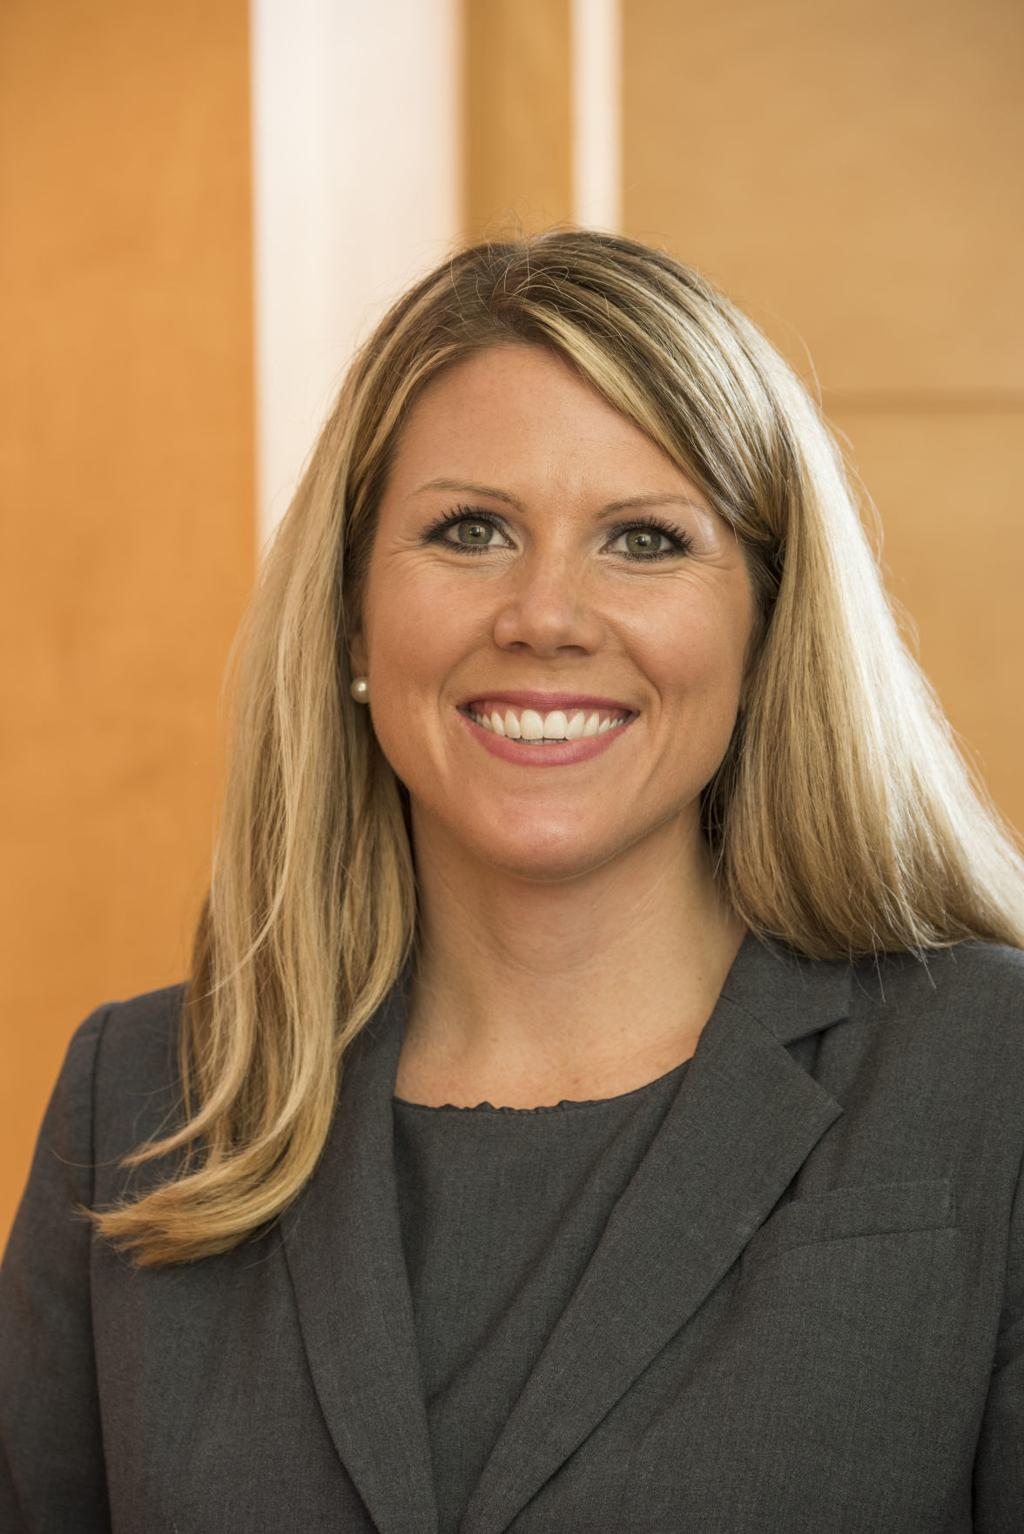 Decision Maker: Kristin Dyer with HCA Virginia's Chippenham